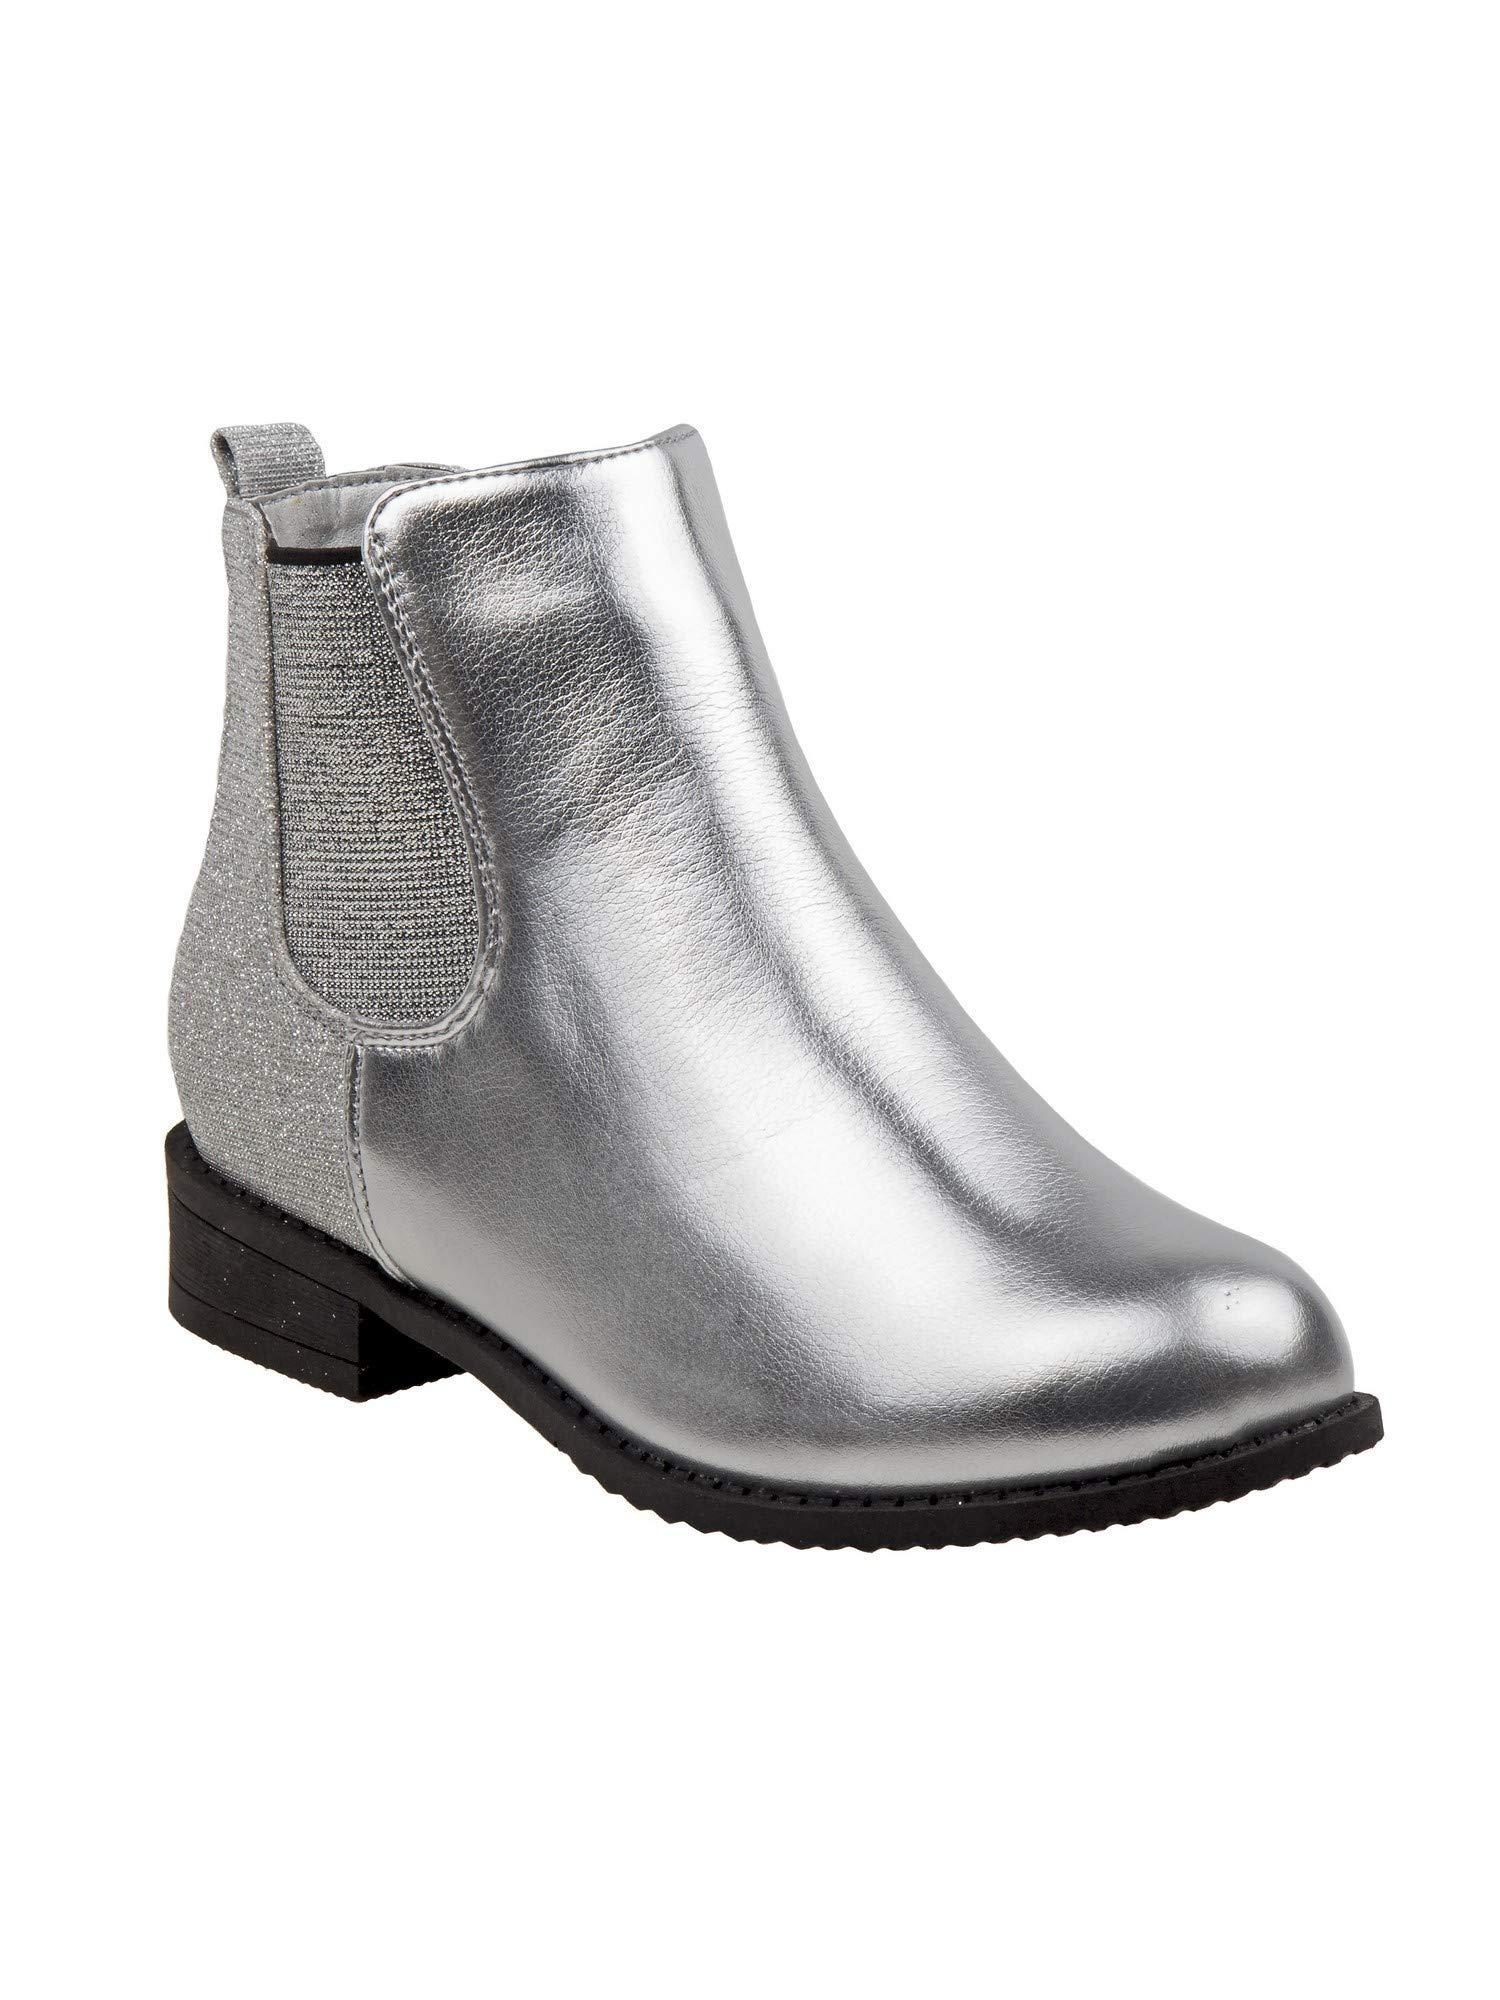 Nanette Lepore Girls Silver Elastic Side Panel Closure Chelsea Boots 1 Kids